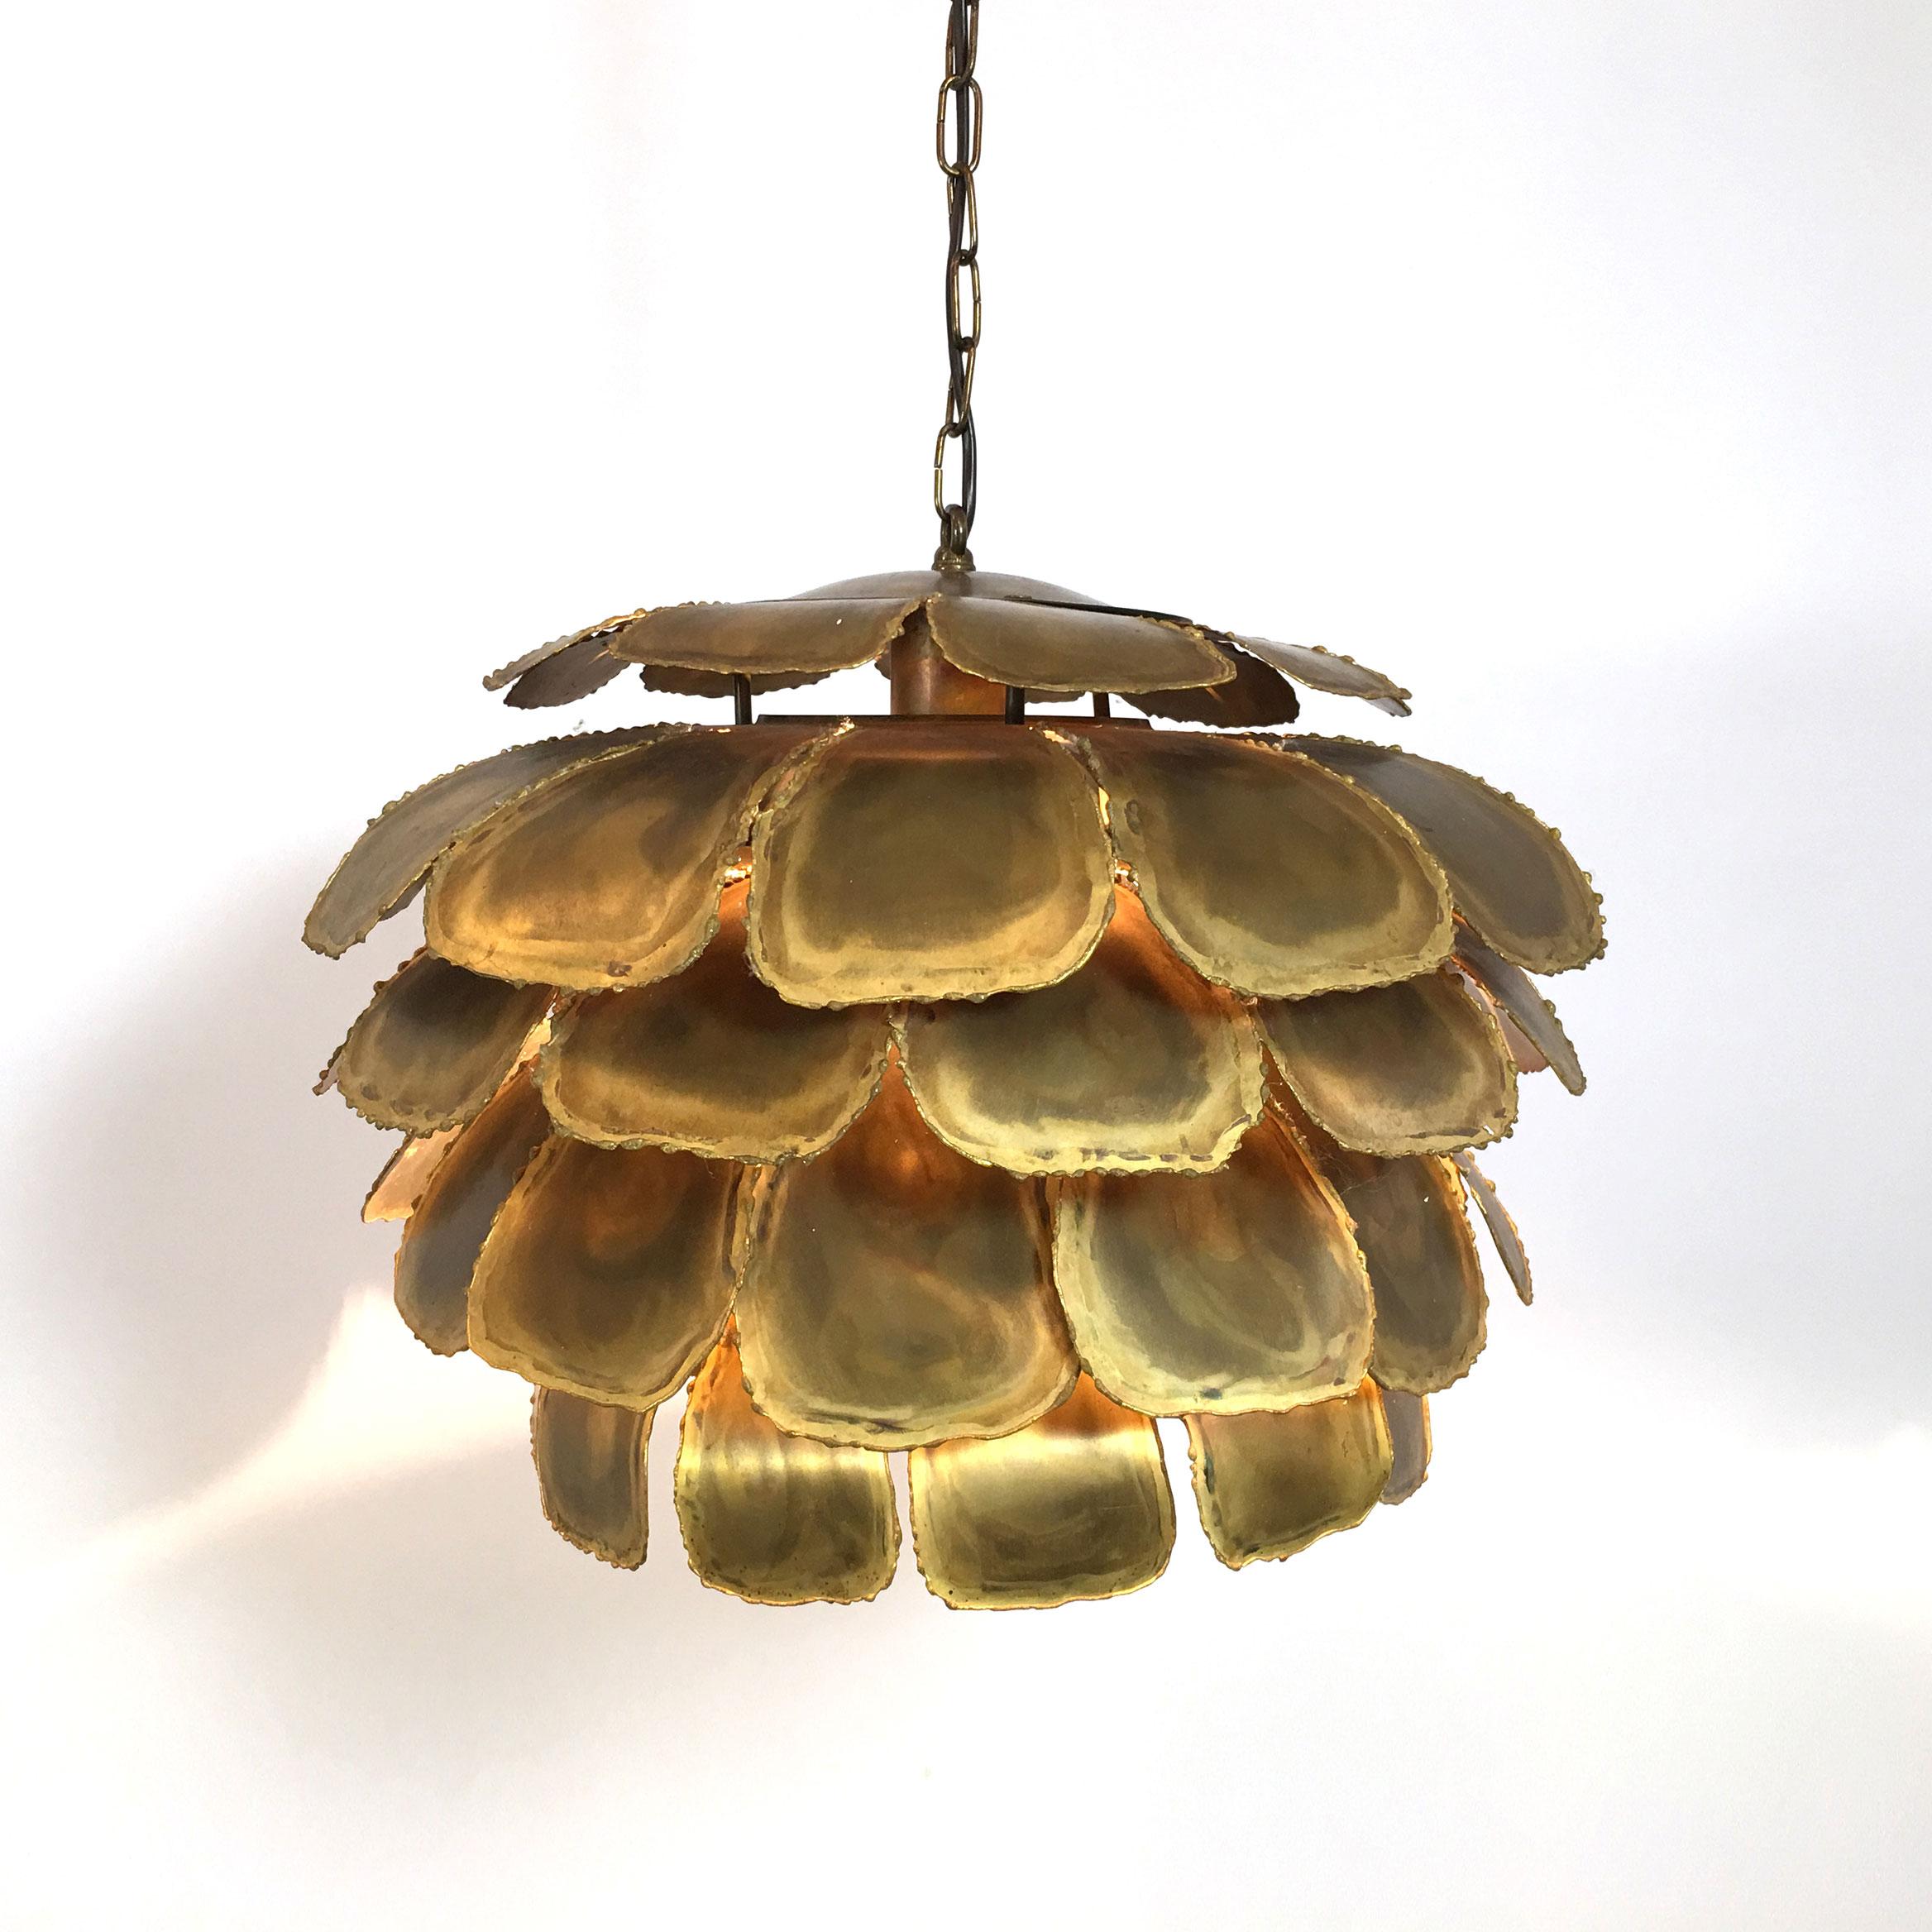 Artichoke pendant by Svend Aage Holm Sorensen.